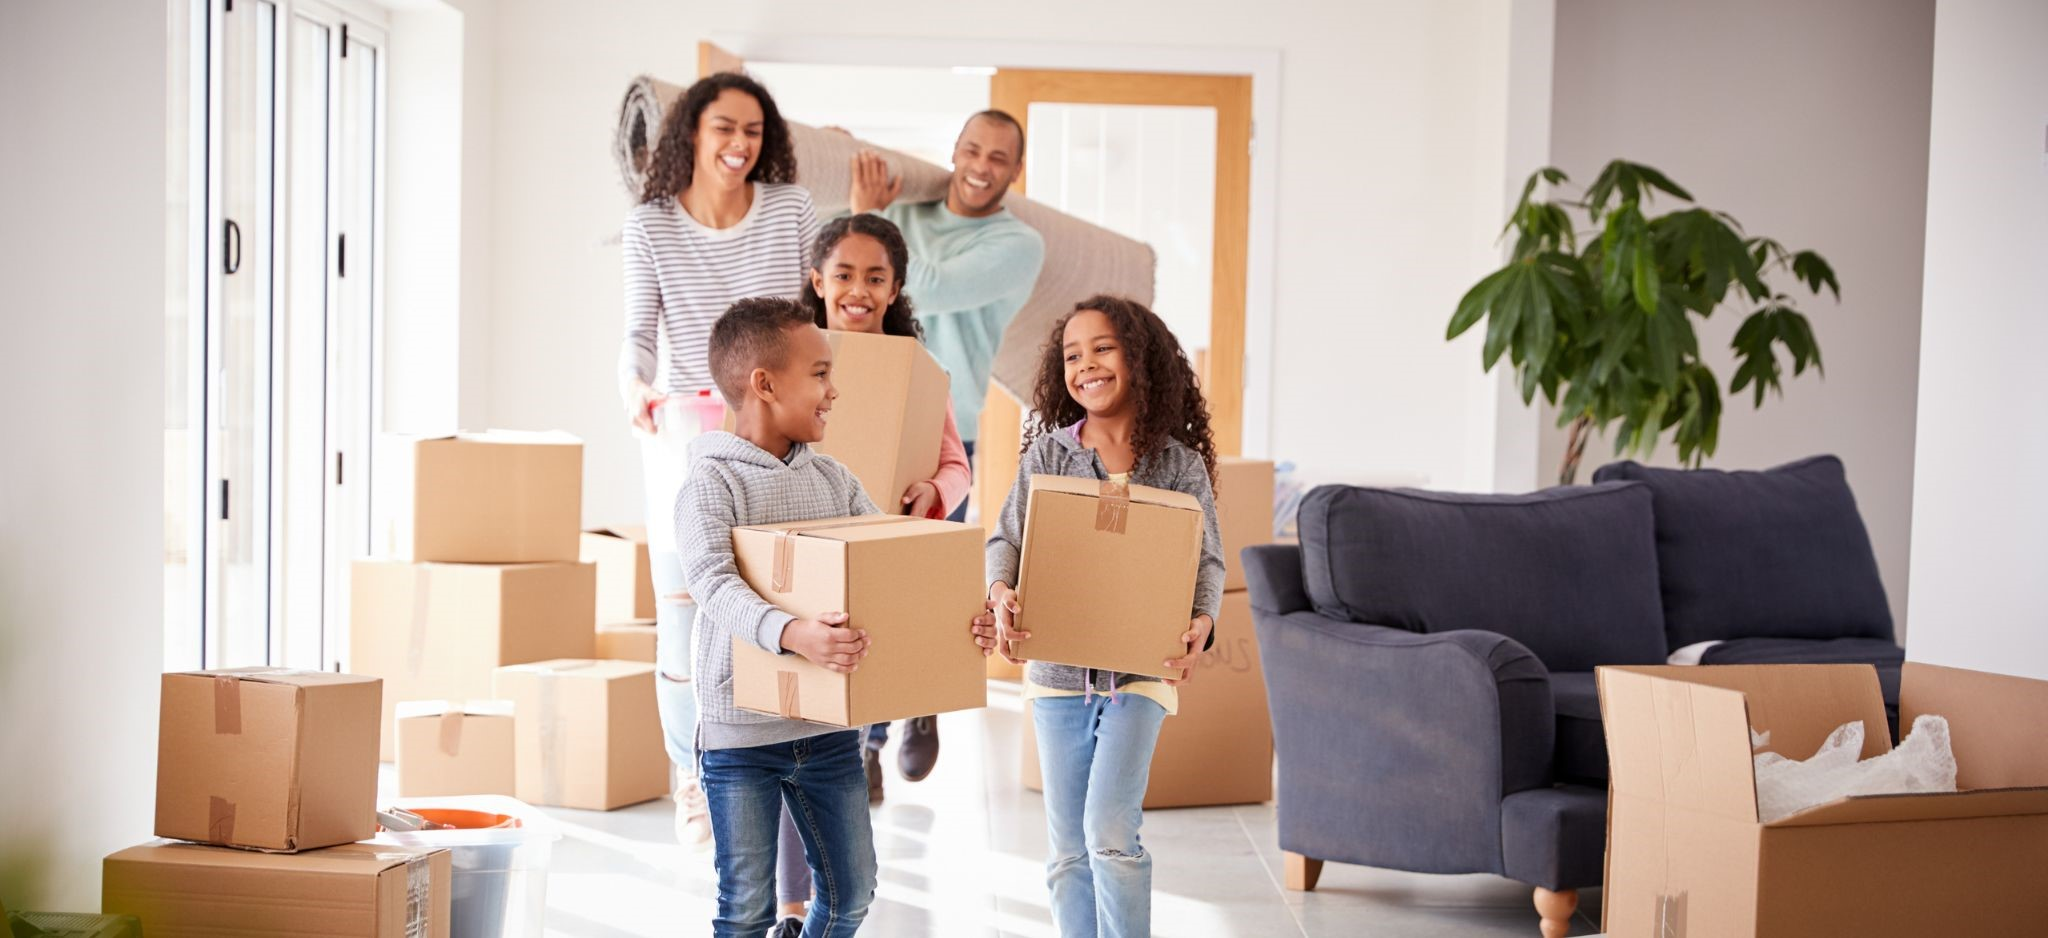 Advantages to Having a Summer Storage Unit